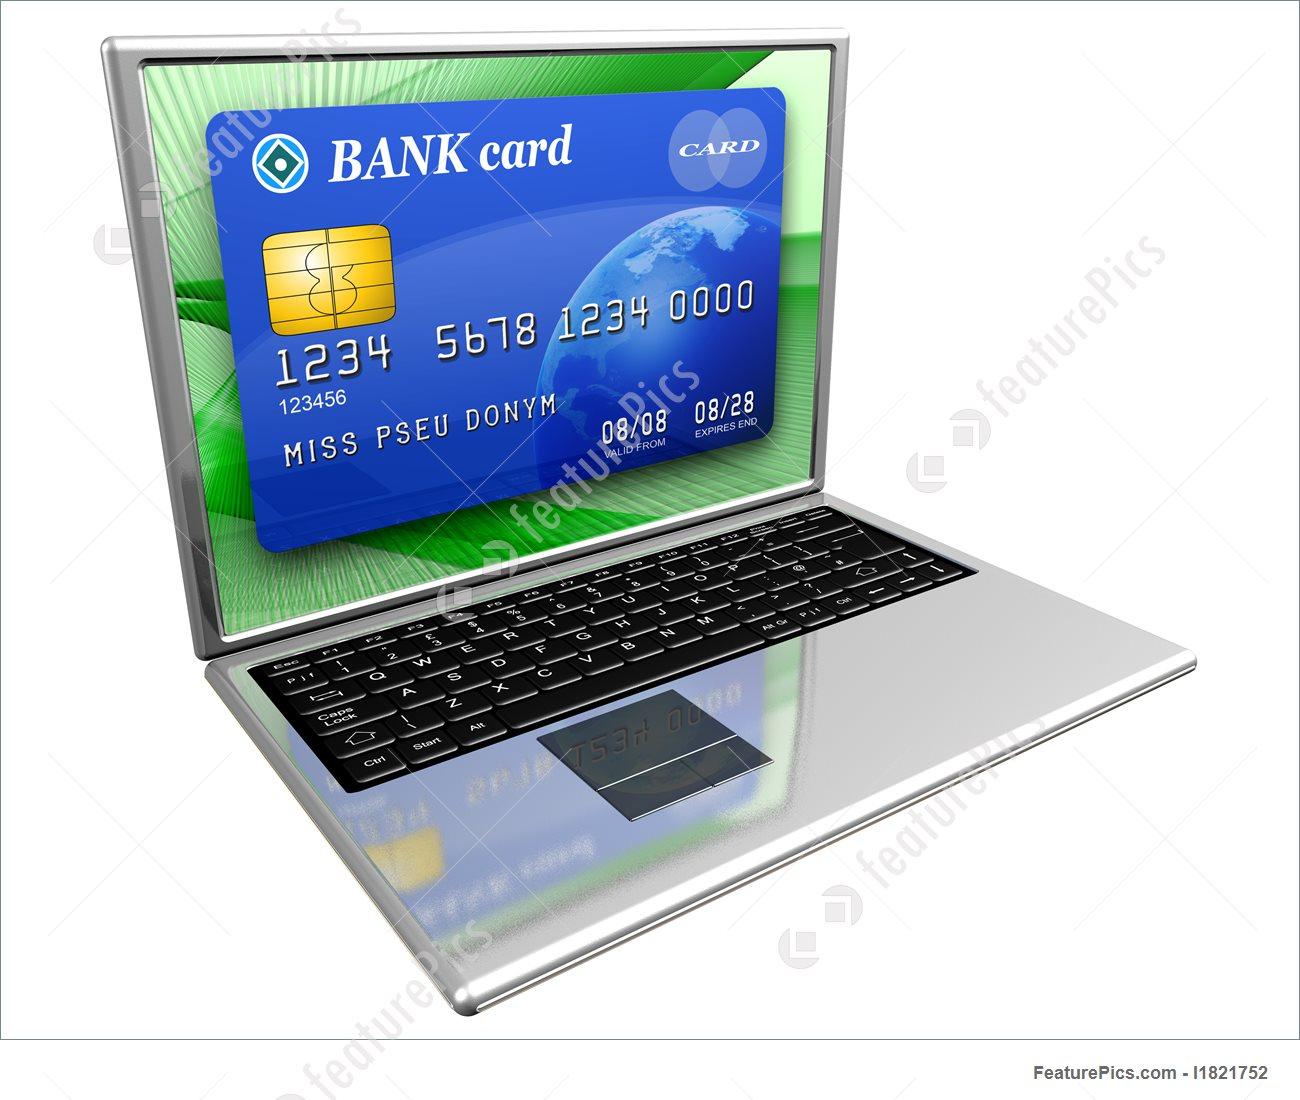 Online Banking Clipart Net Banking-Online Banking Clipart net banking-12